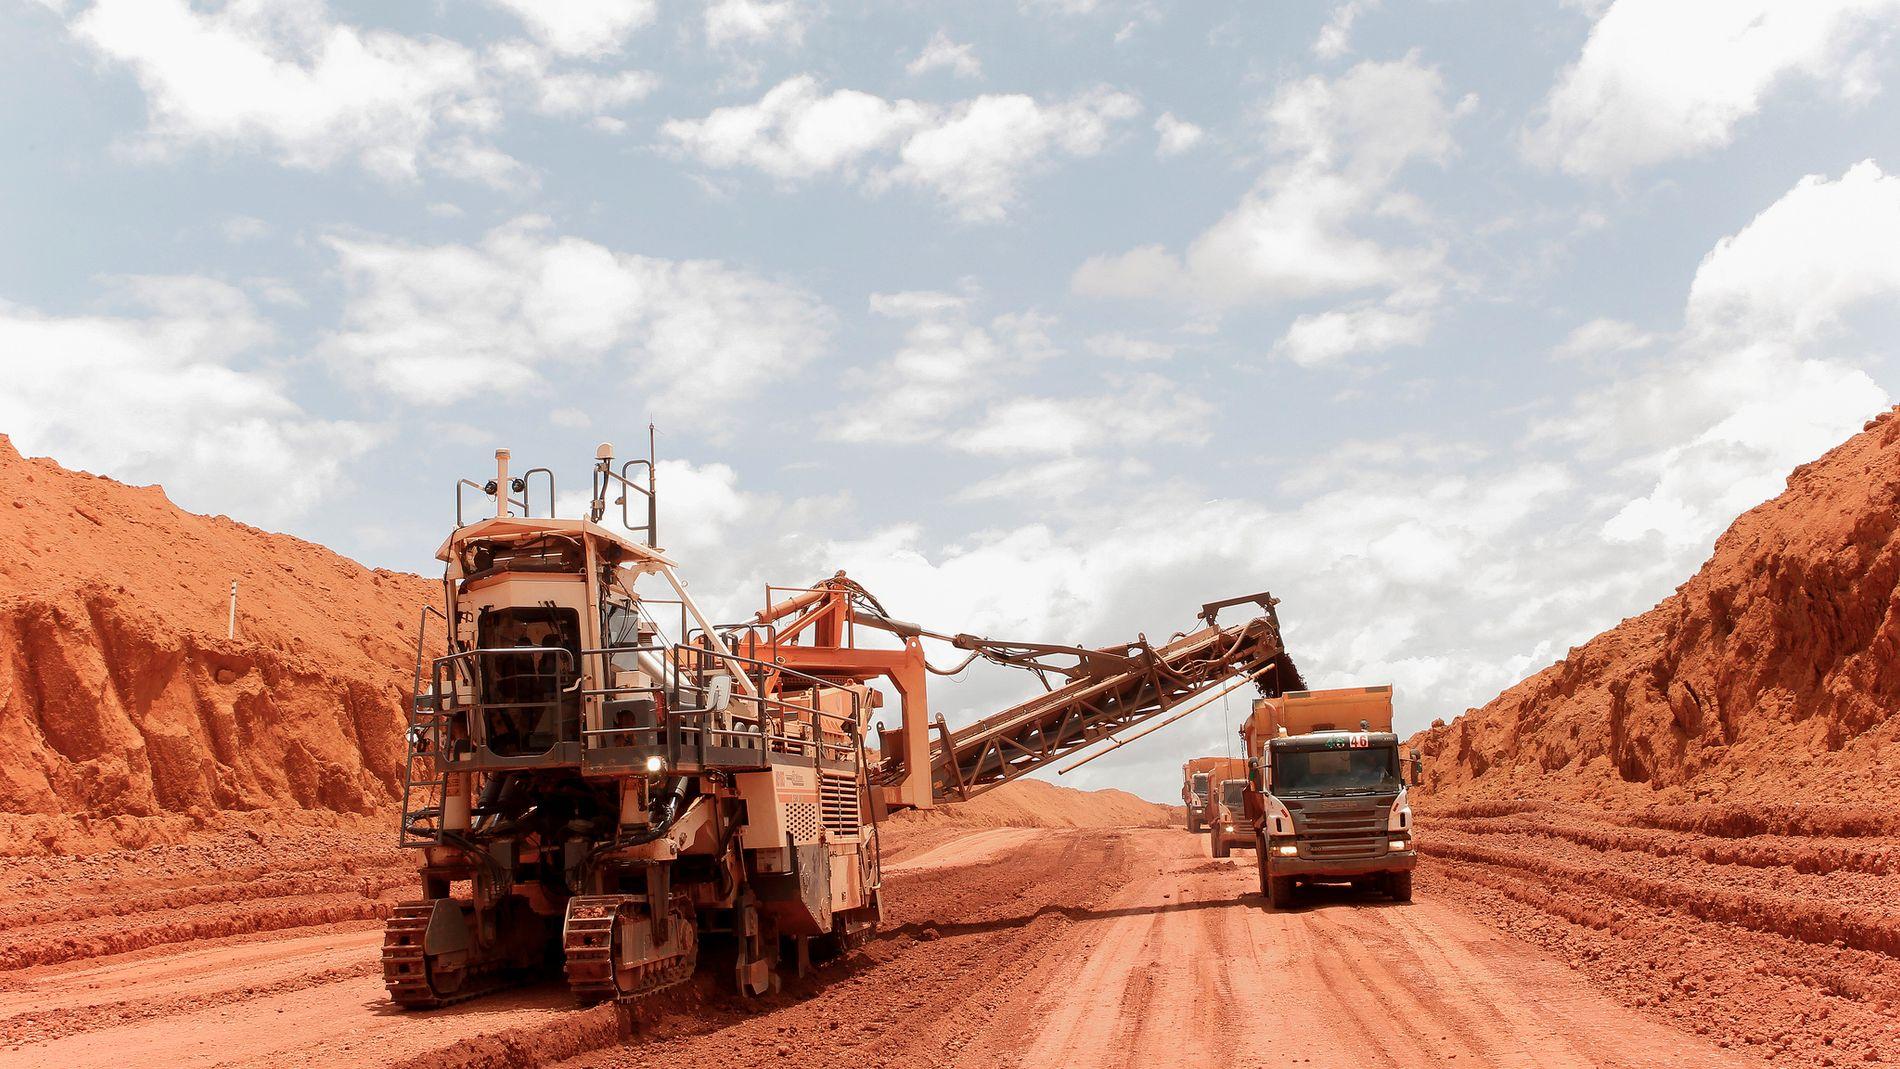 RAMMER GRUVE: Bauksittgruven Paragominas har drevet på halv kapasitet i flere måneder etter trøbbel på raffineriet Alunorte.